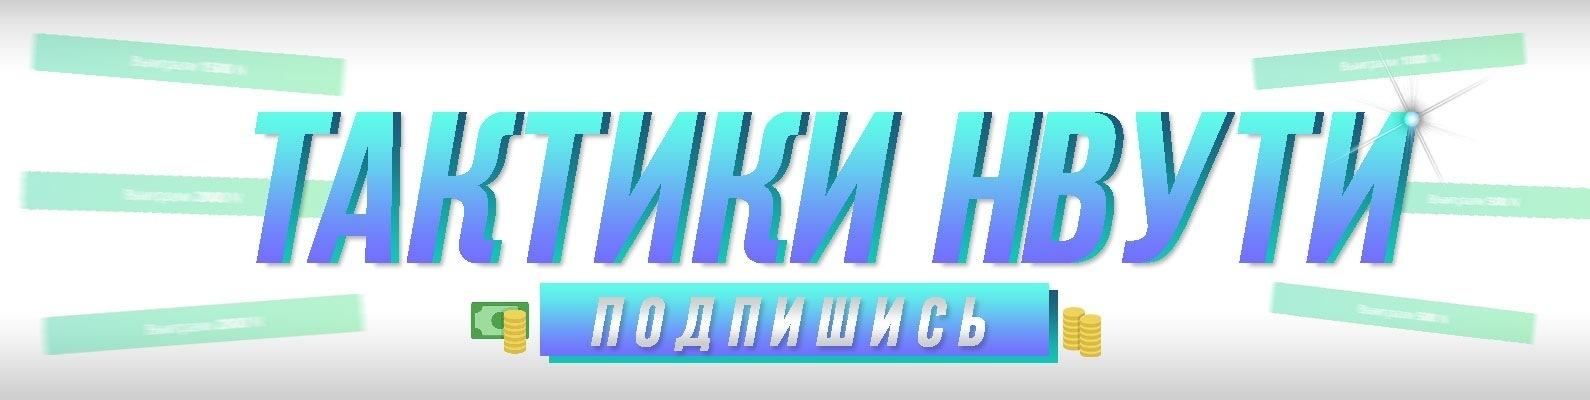 nvuti DICE2X тактики | ВКонтакте